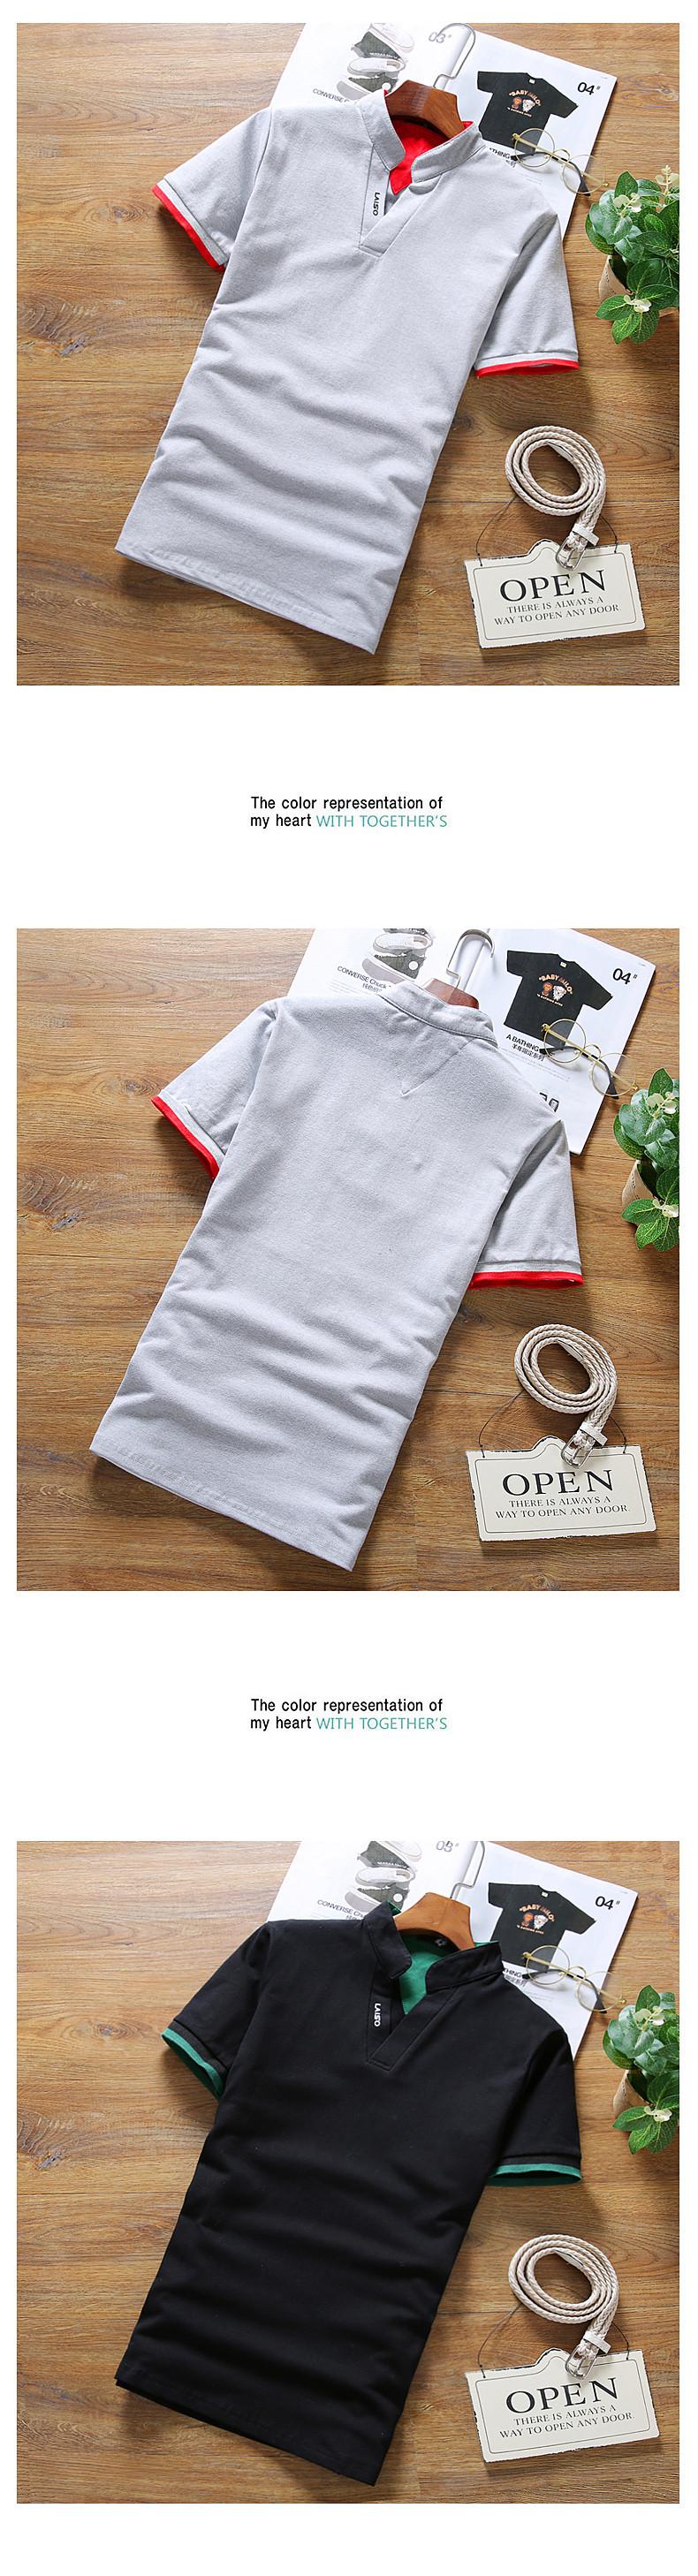 2019 New Arrival Cotton Men Polo Shirt Tops Fashion Brand Plus Size Short Sleeve Black White Polo Shirt Homme Camisa 5XL 18